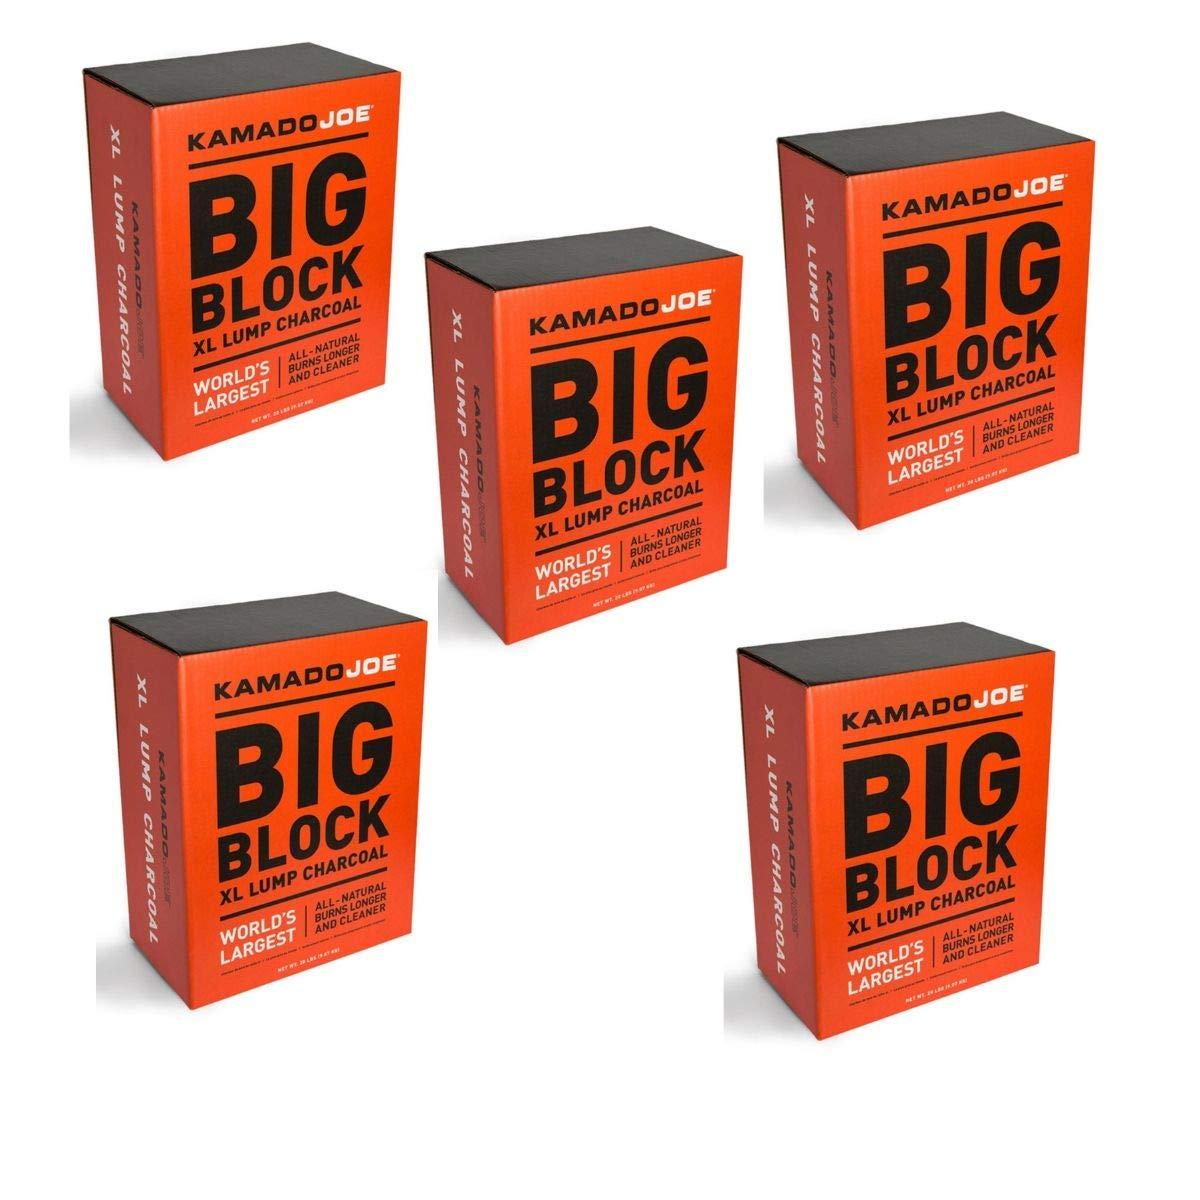 Kamado Joe KJ-Char Hardwood Lump Charcoal, Extra Large (5 Packs - Extra Large Lump Charcoal)